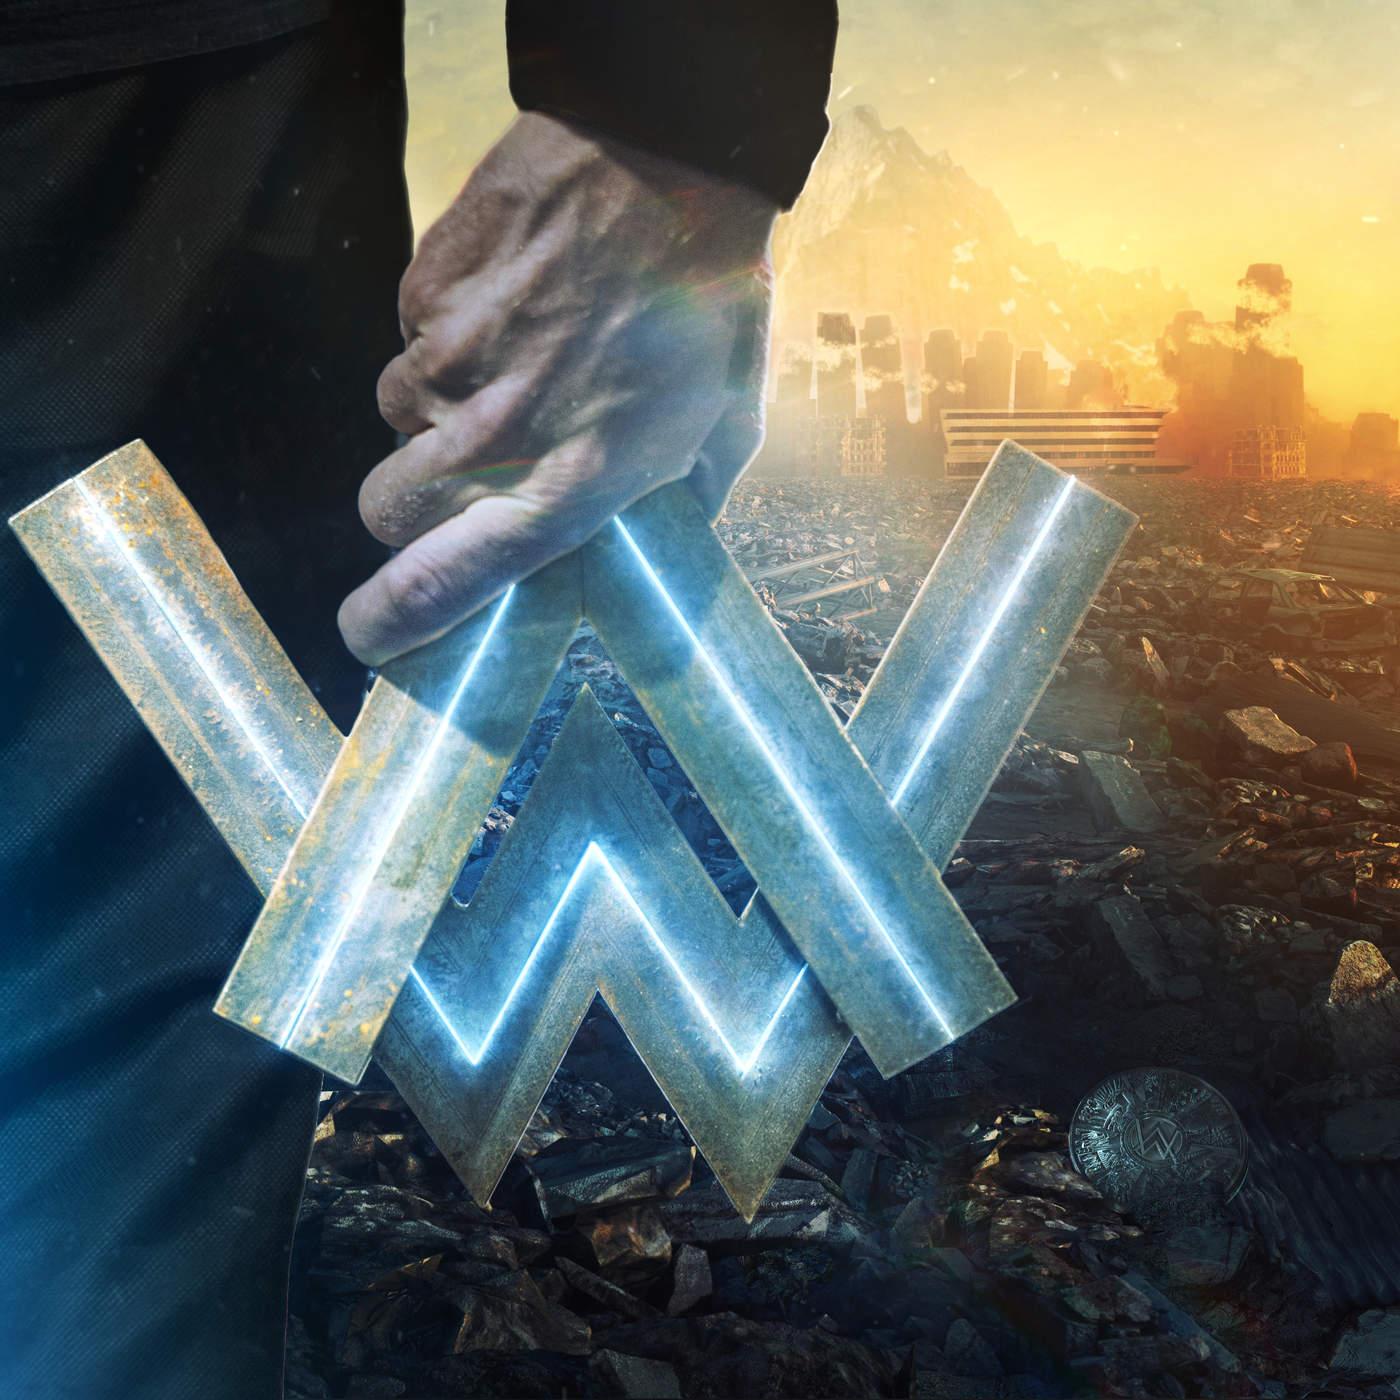 Alan Walker, Noah Cyrus & Digital Farm Animals - All Falls Down - Single